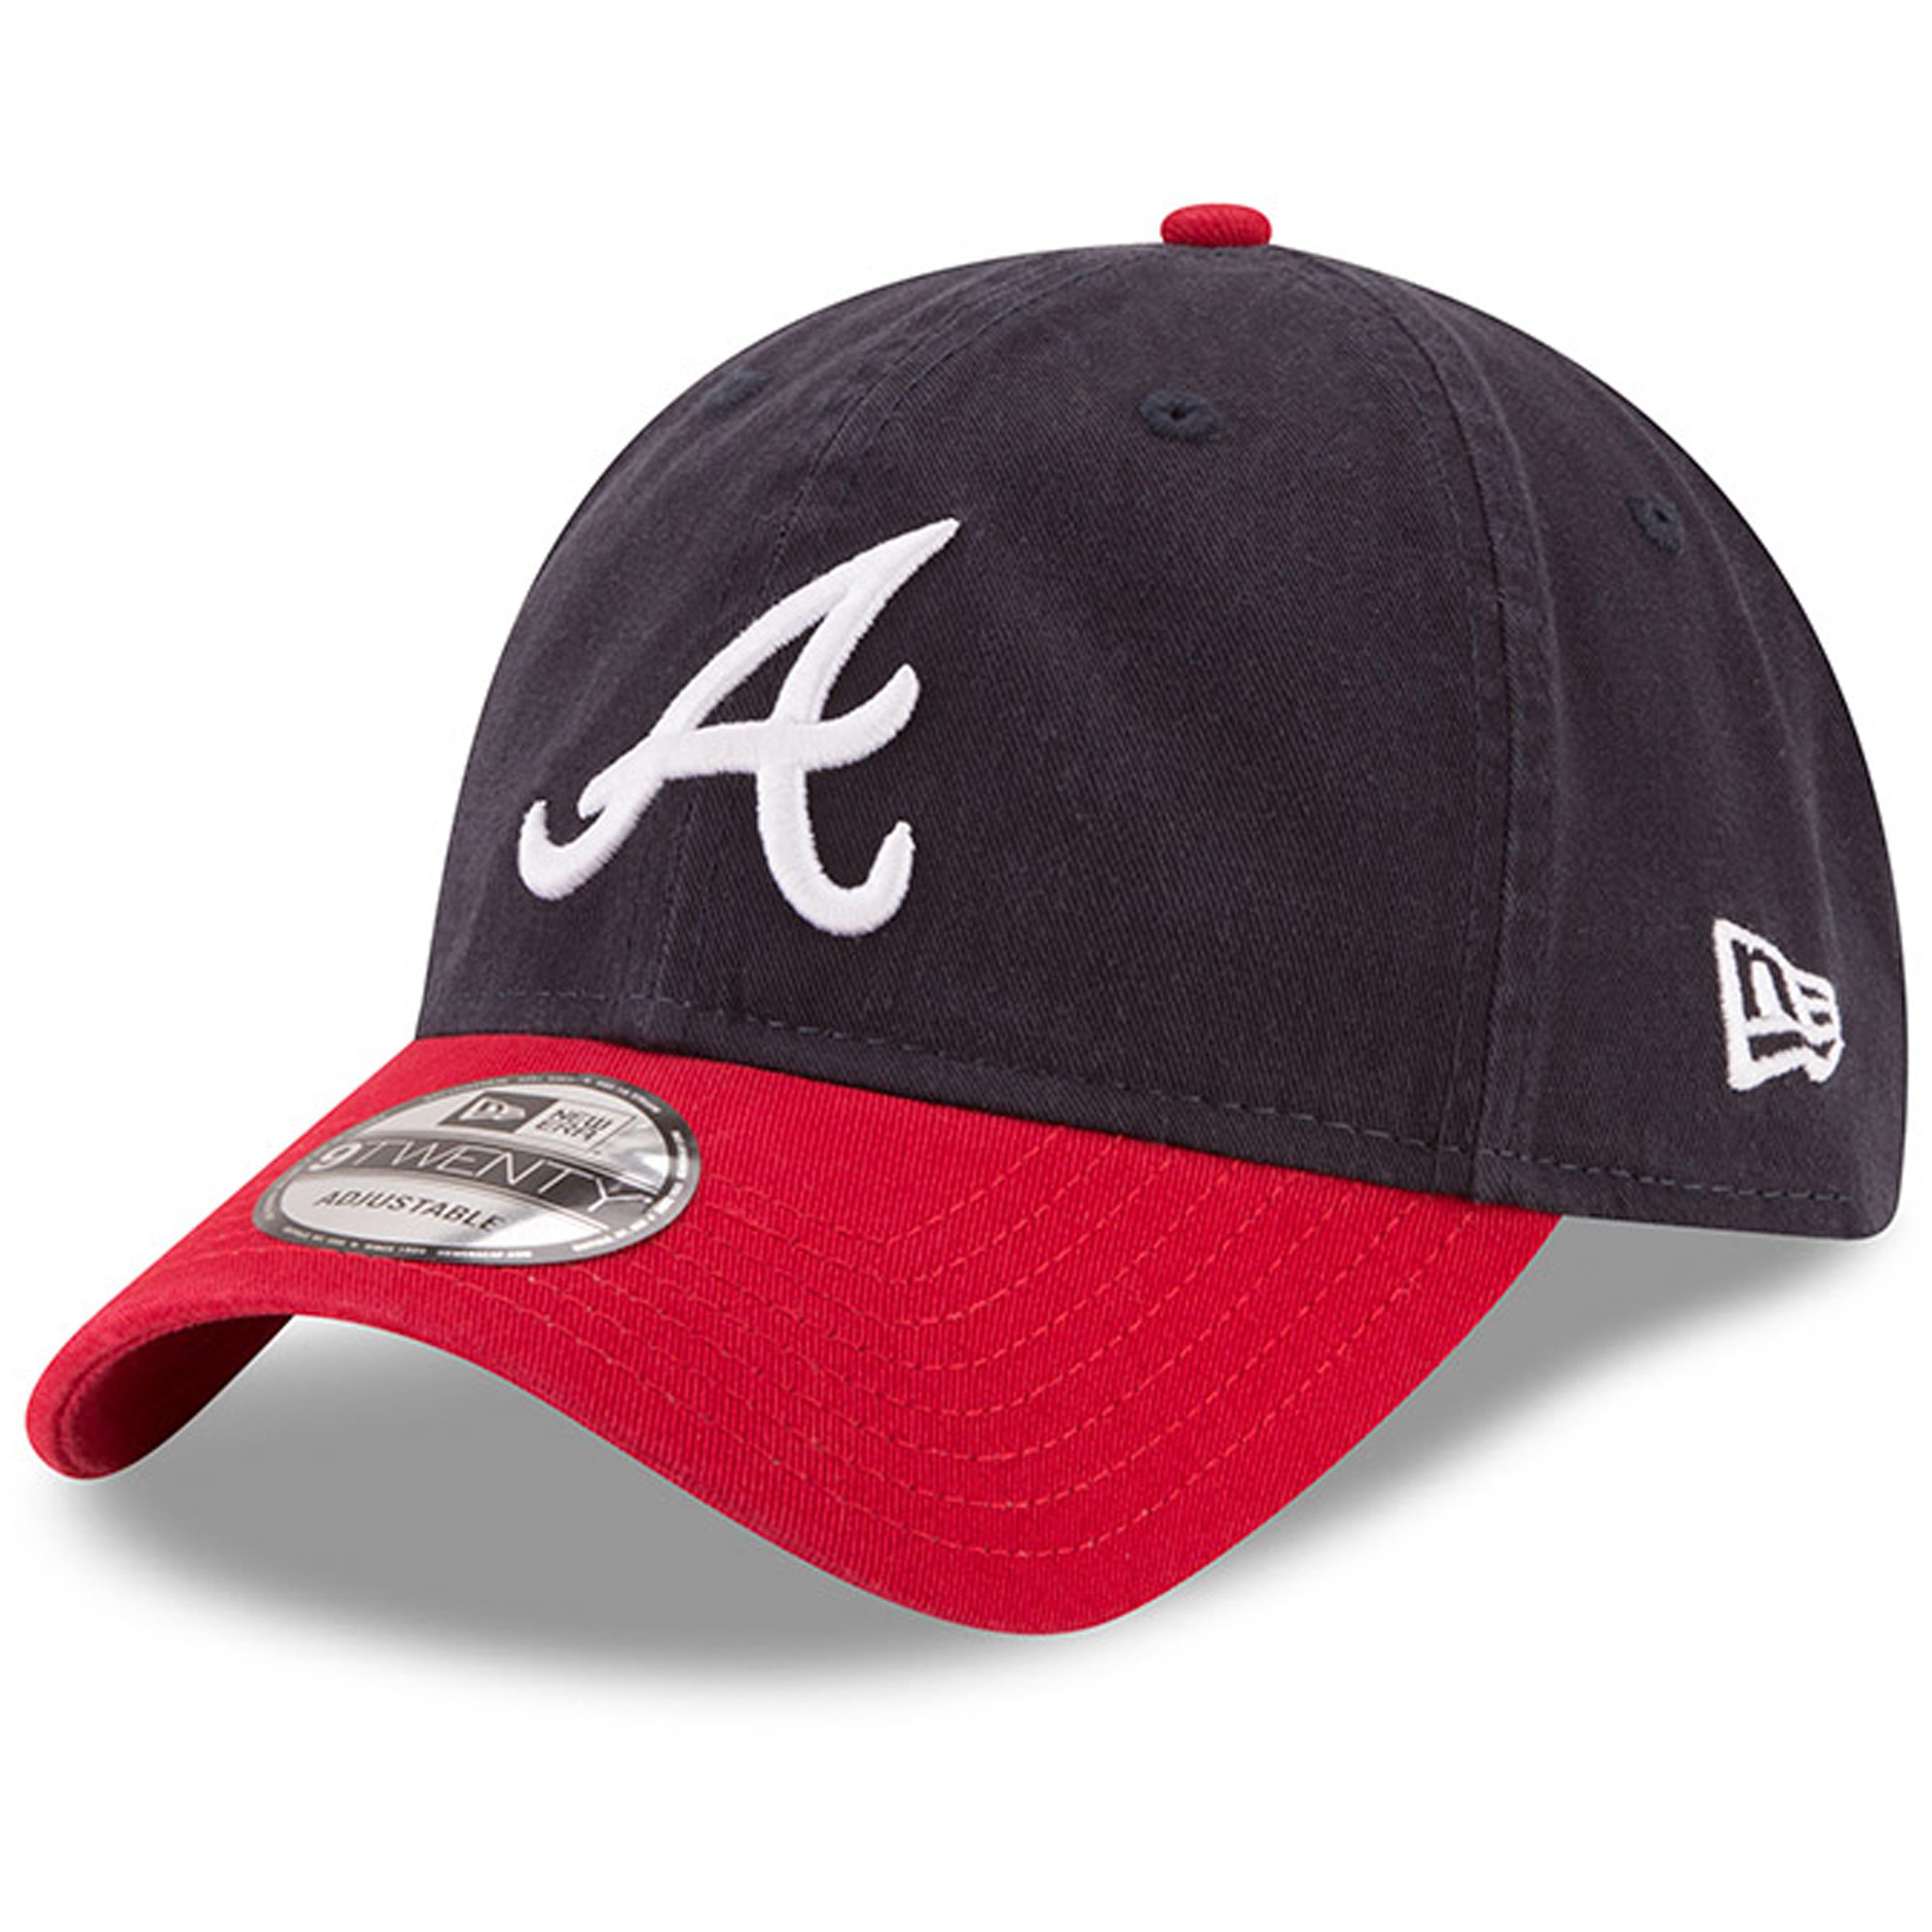 Atlanta Braves New Era Home Replica Core Classic 9TWENTY Adjustable Hat - Navy/Red - OSFA